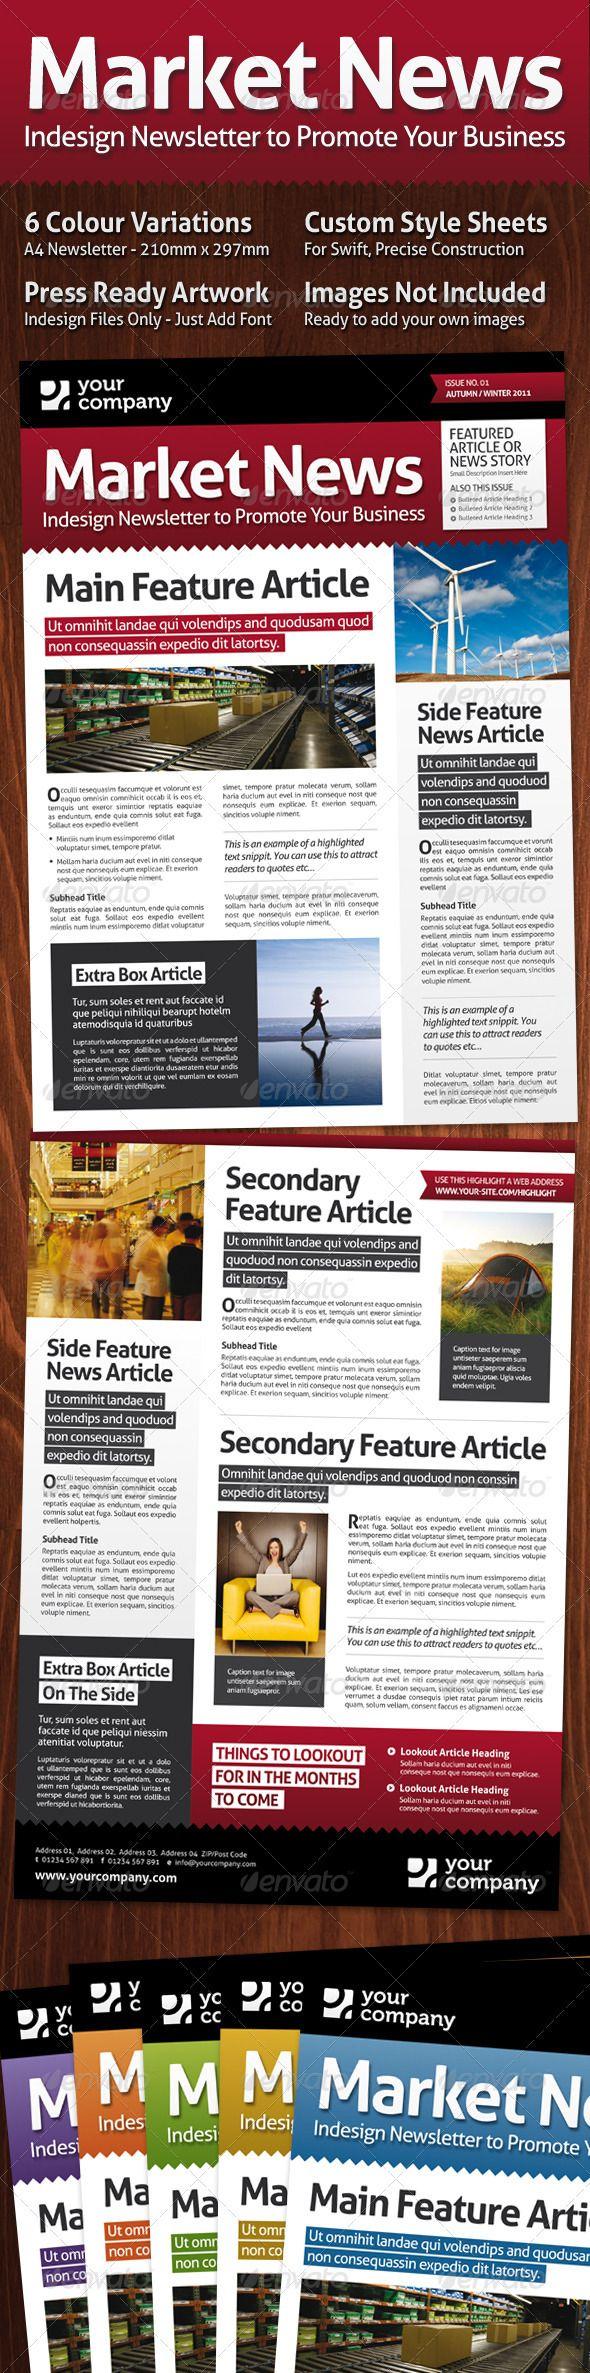 Market News A4 Magazine Style Newsletter 78